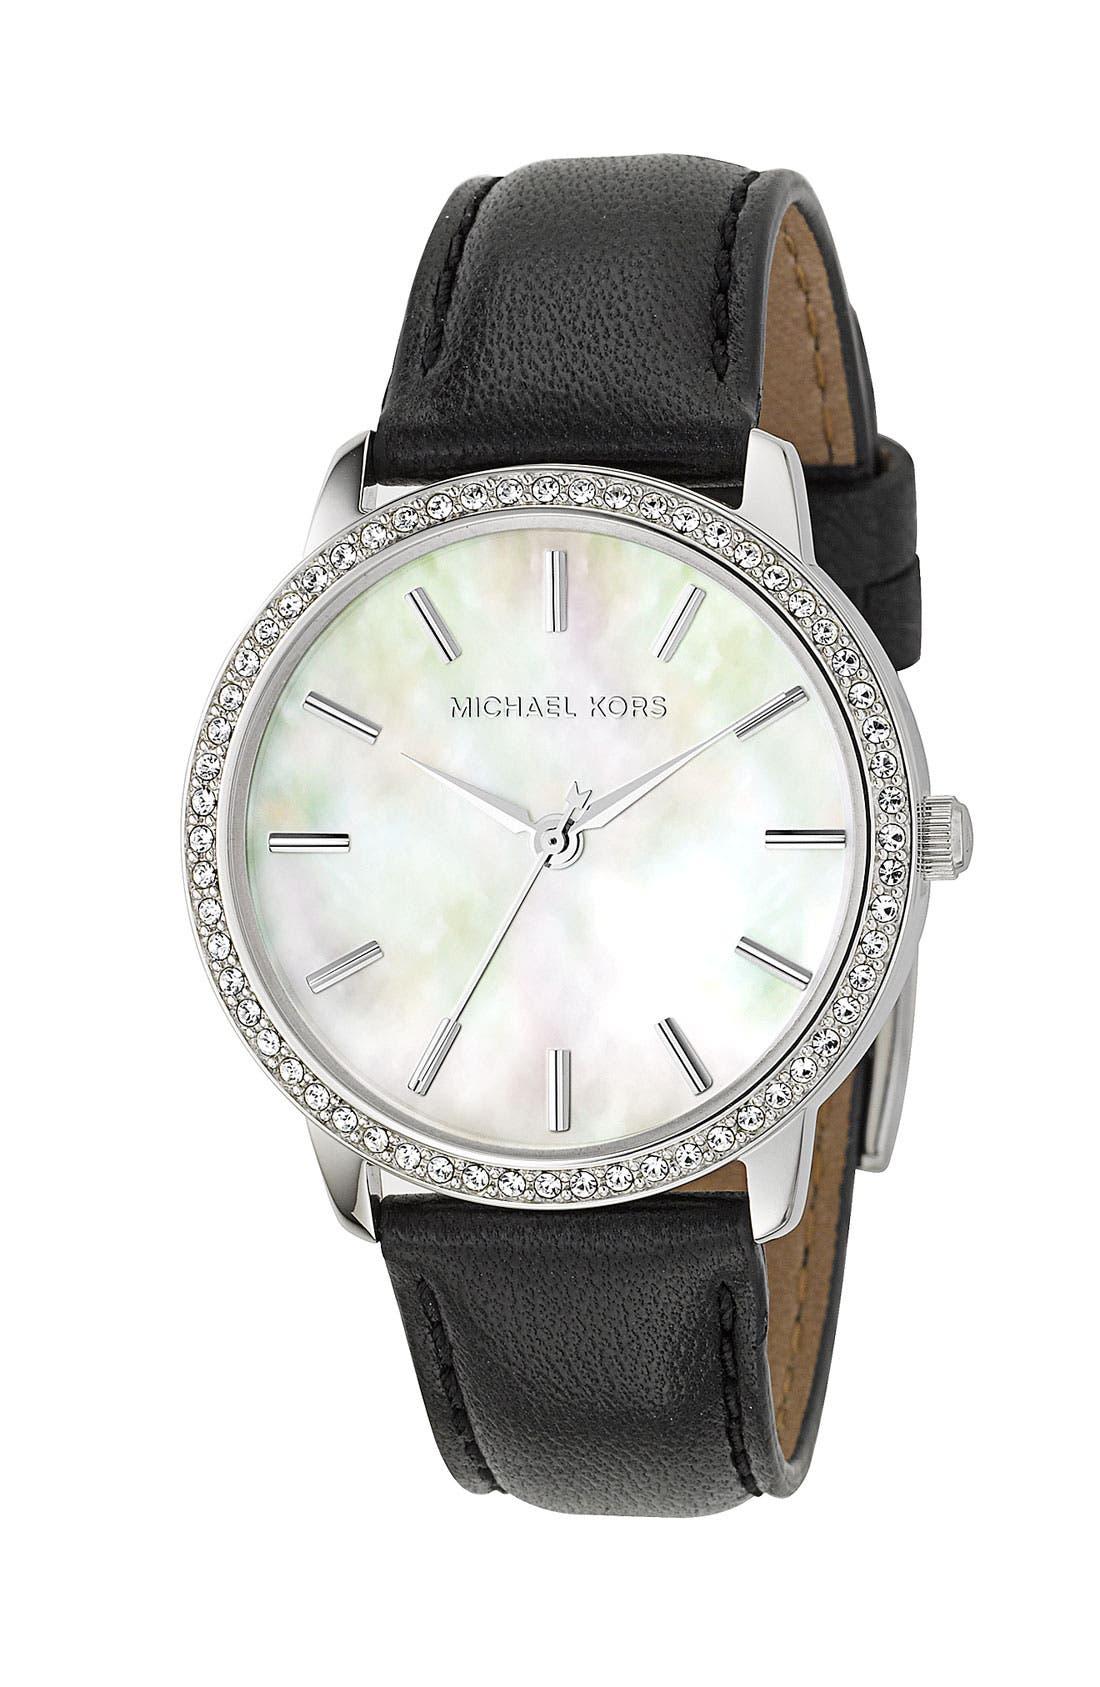 MICHAEL MICHAEL KORS Michael Kors Crystal Rim Bracelet Watch, Main, color, 002